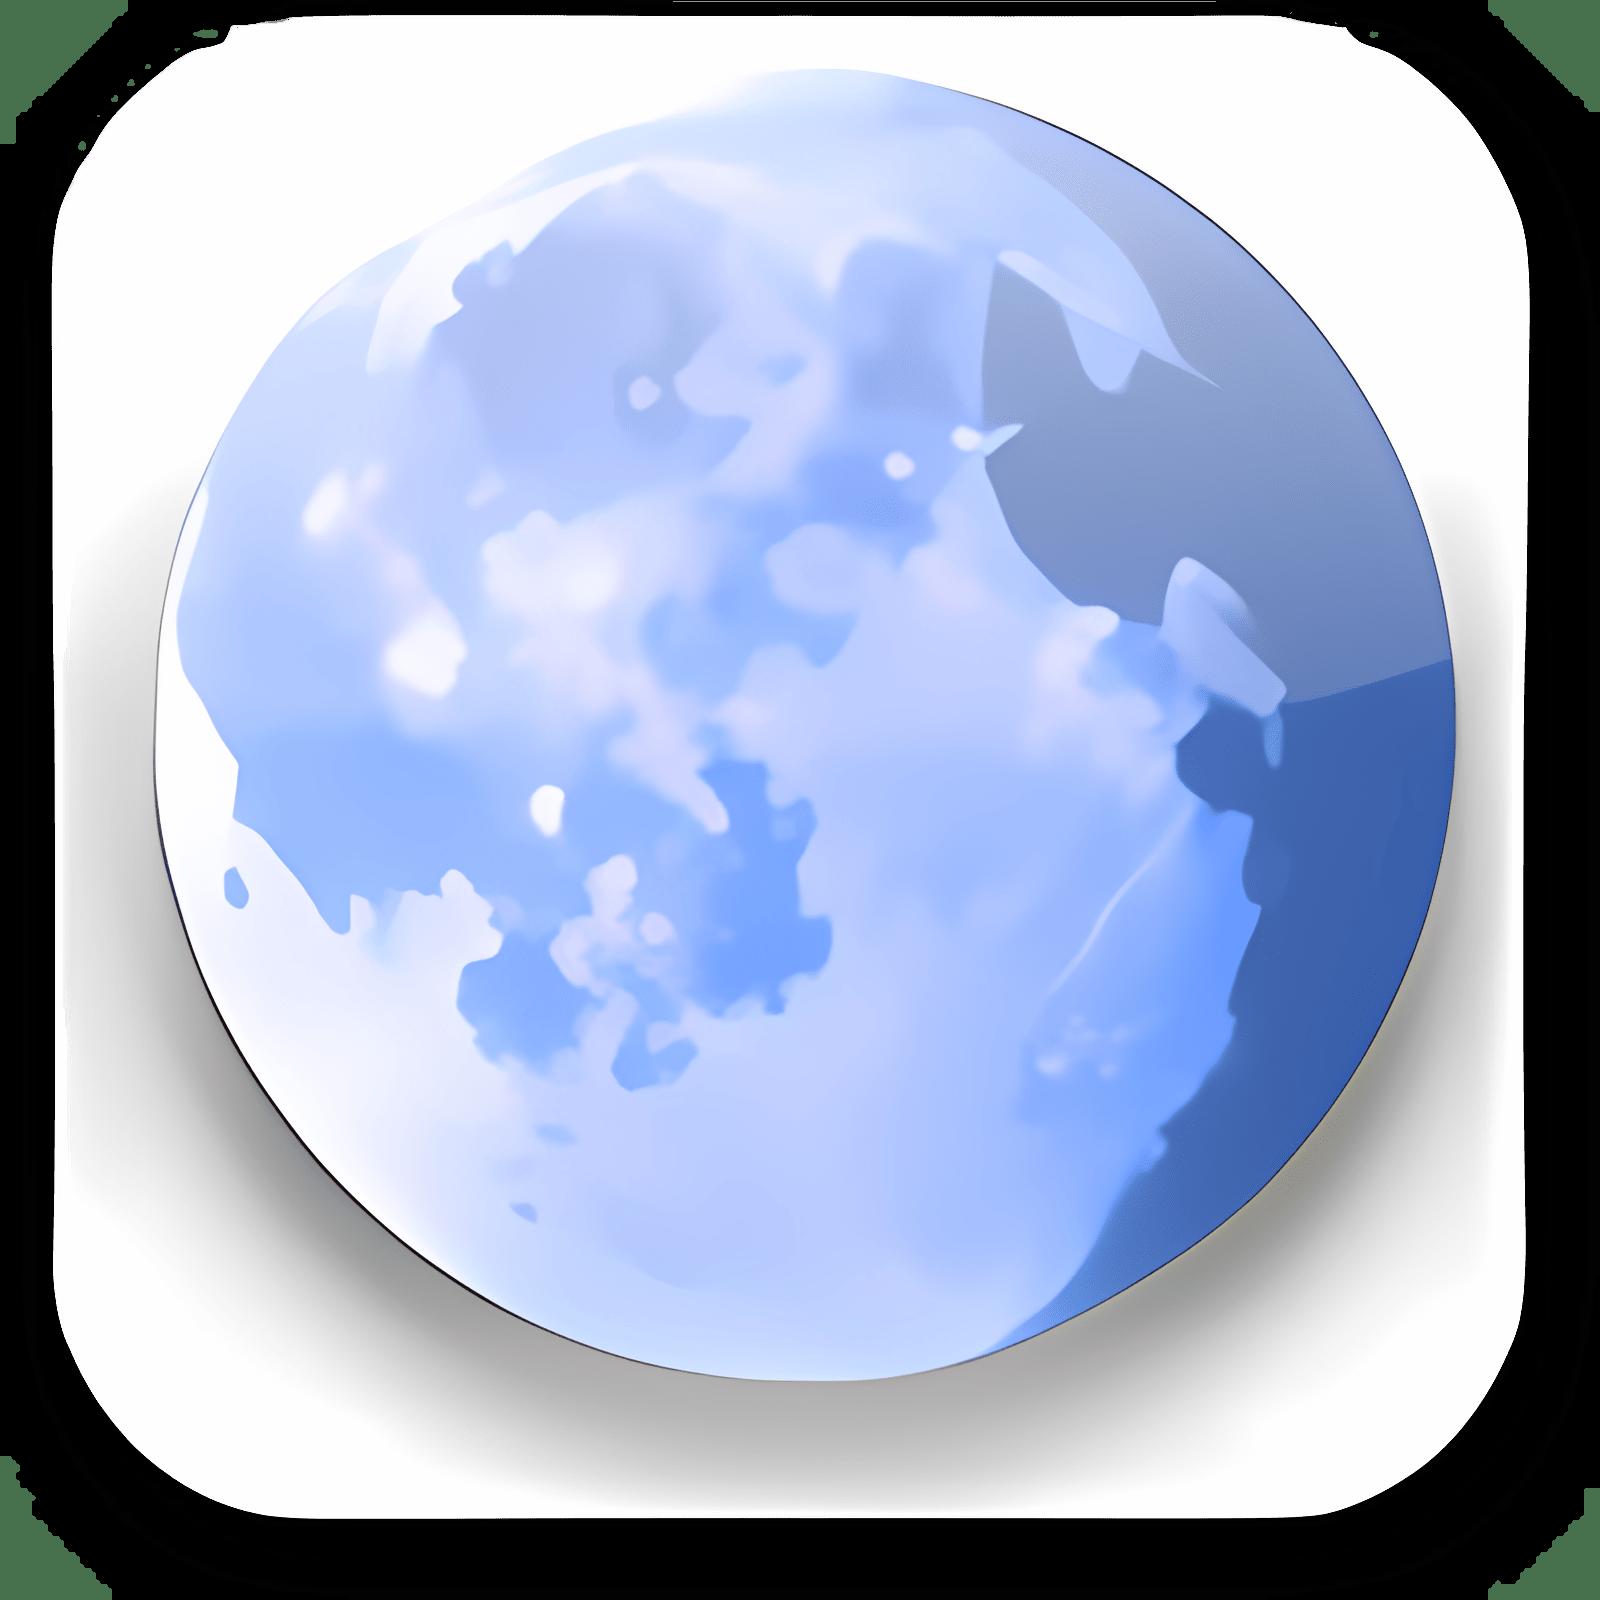 Pale Moon